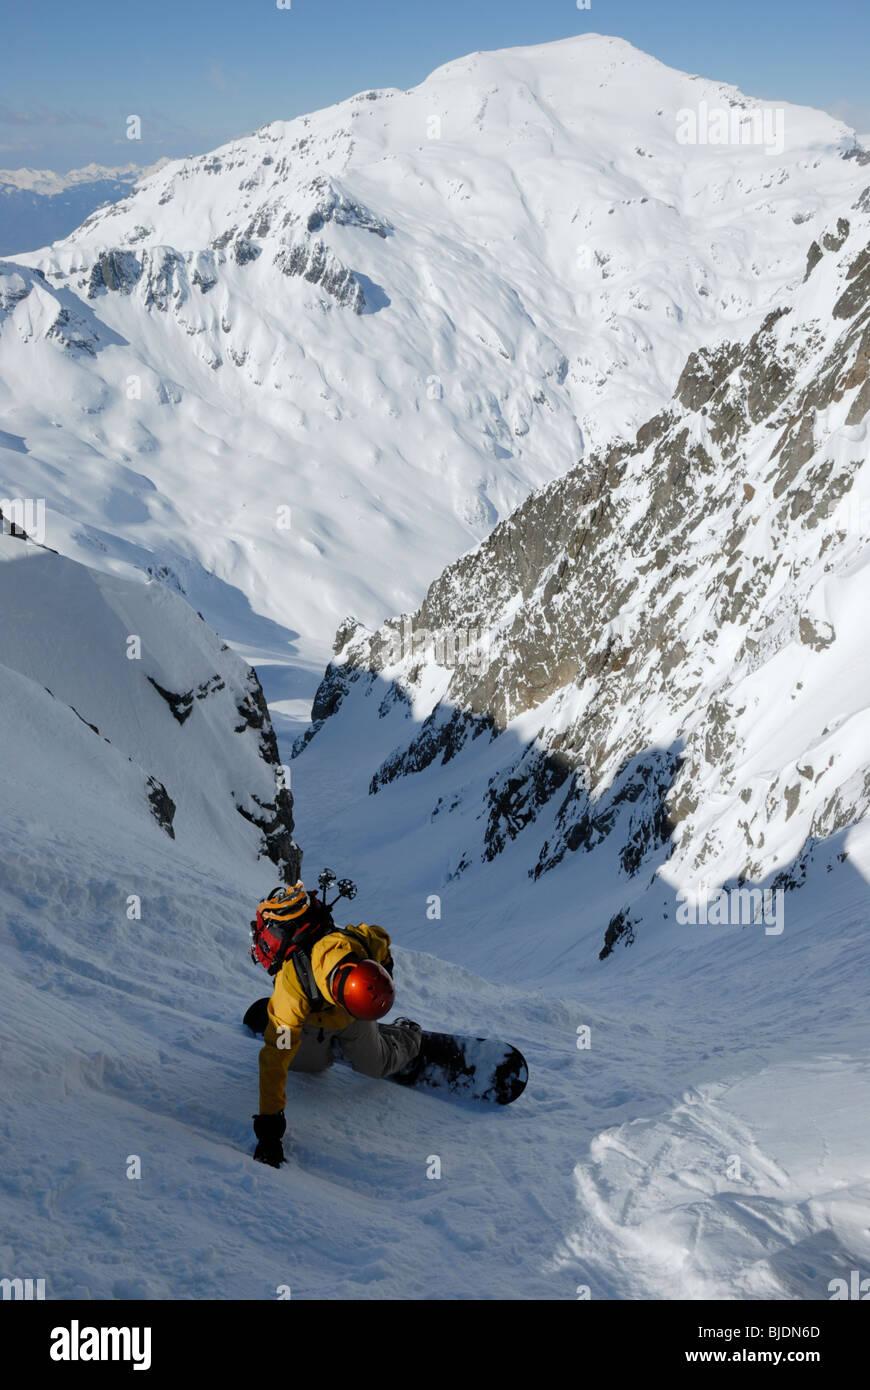 Snowboarder entering very steep gully at Col Belvede, near Le Brevent-Flegere ski resort, Chamonix, France. Mt Buet - Stock Image